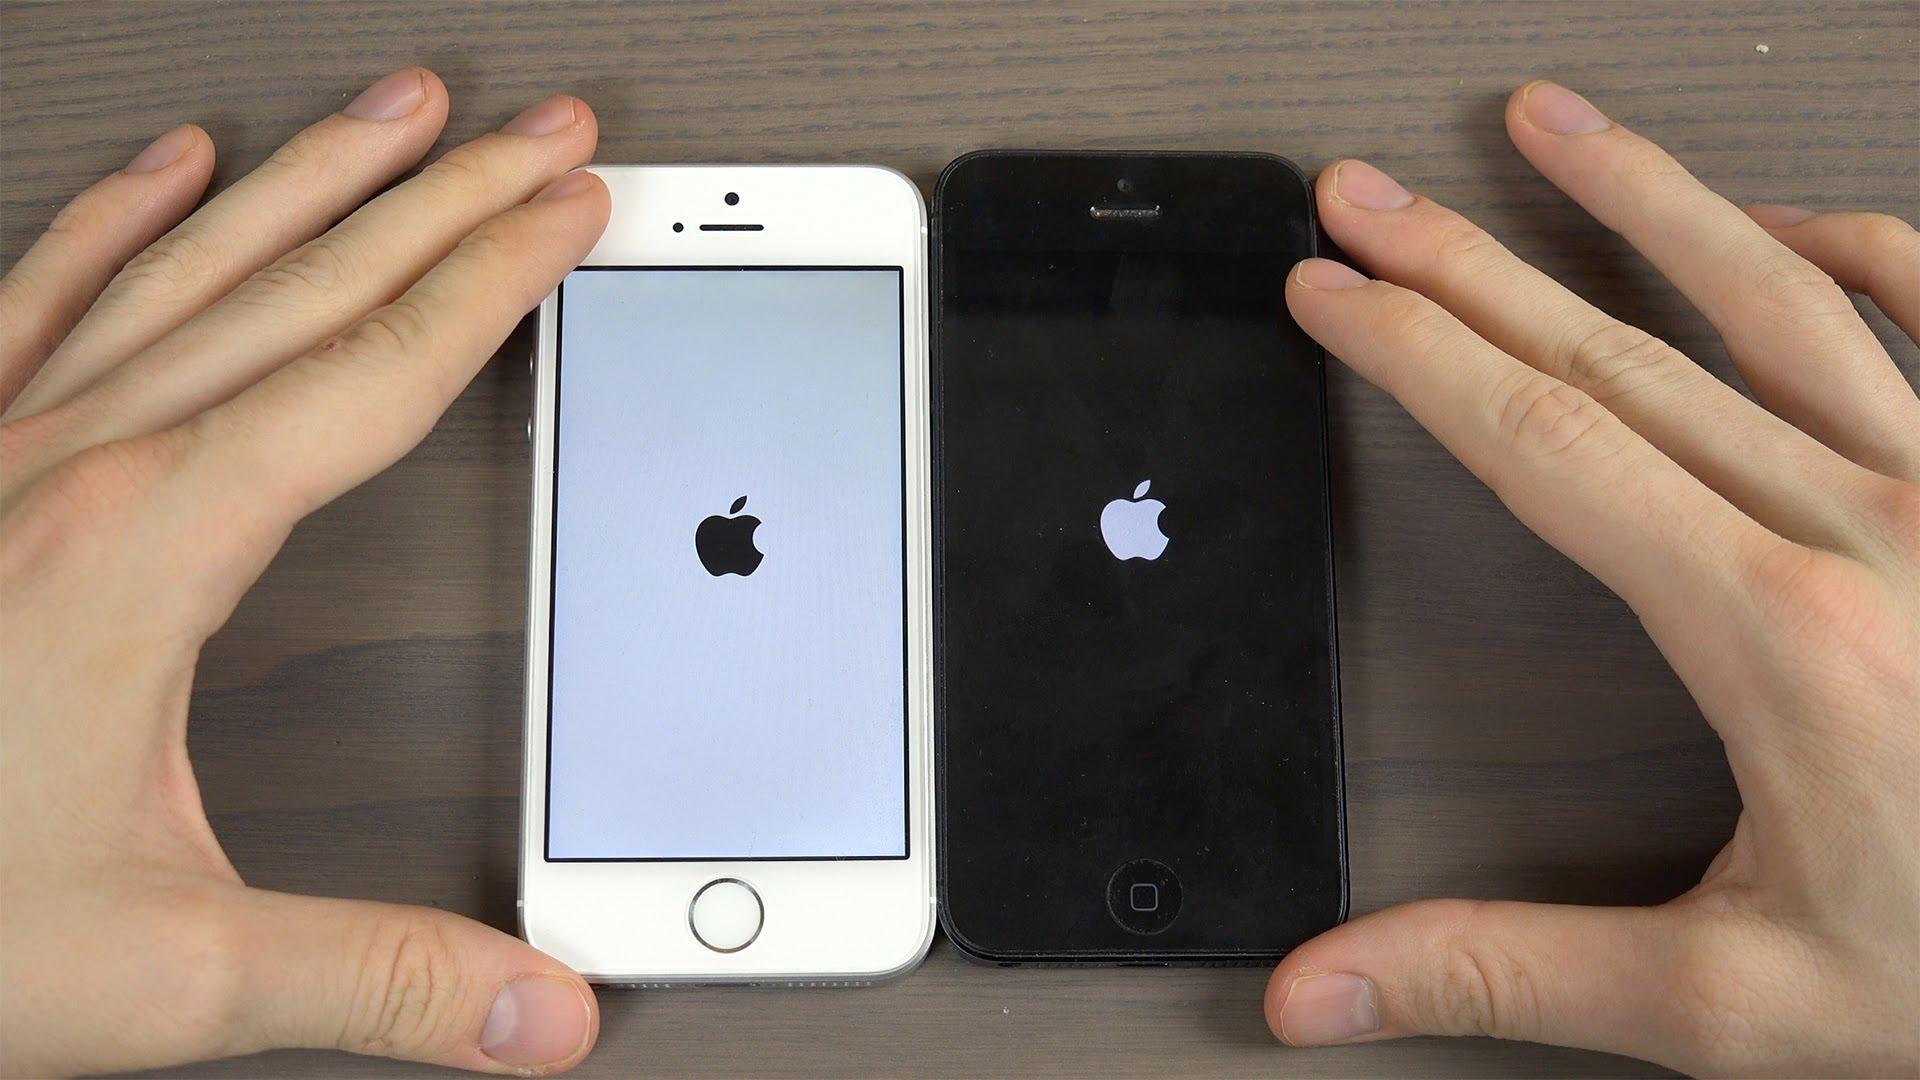 IPHONE 5 VS IPHONE 5S VS IPHONE SE